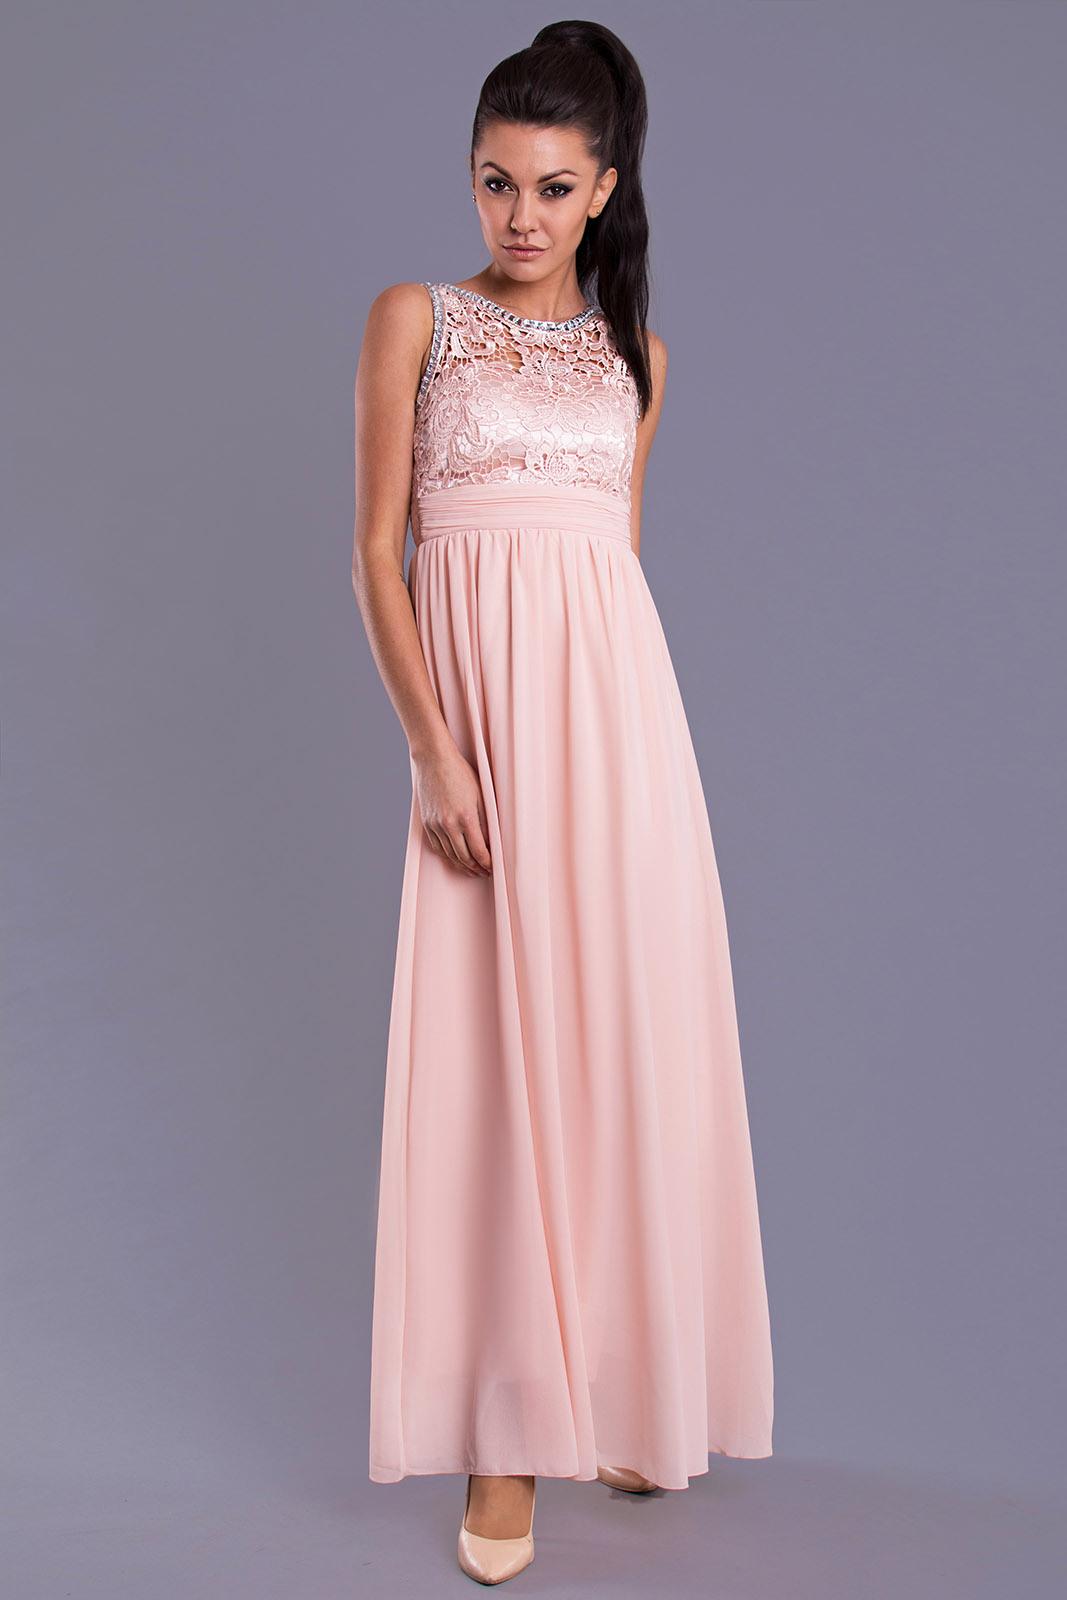 13 Perfekt Altrosa Kleid Lang Ärmel20 Einzigartig Altrosa Kleid Lang für 2019